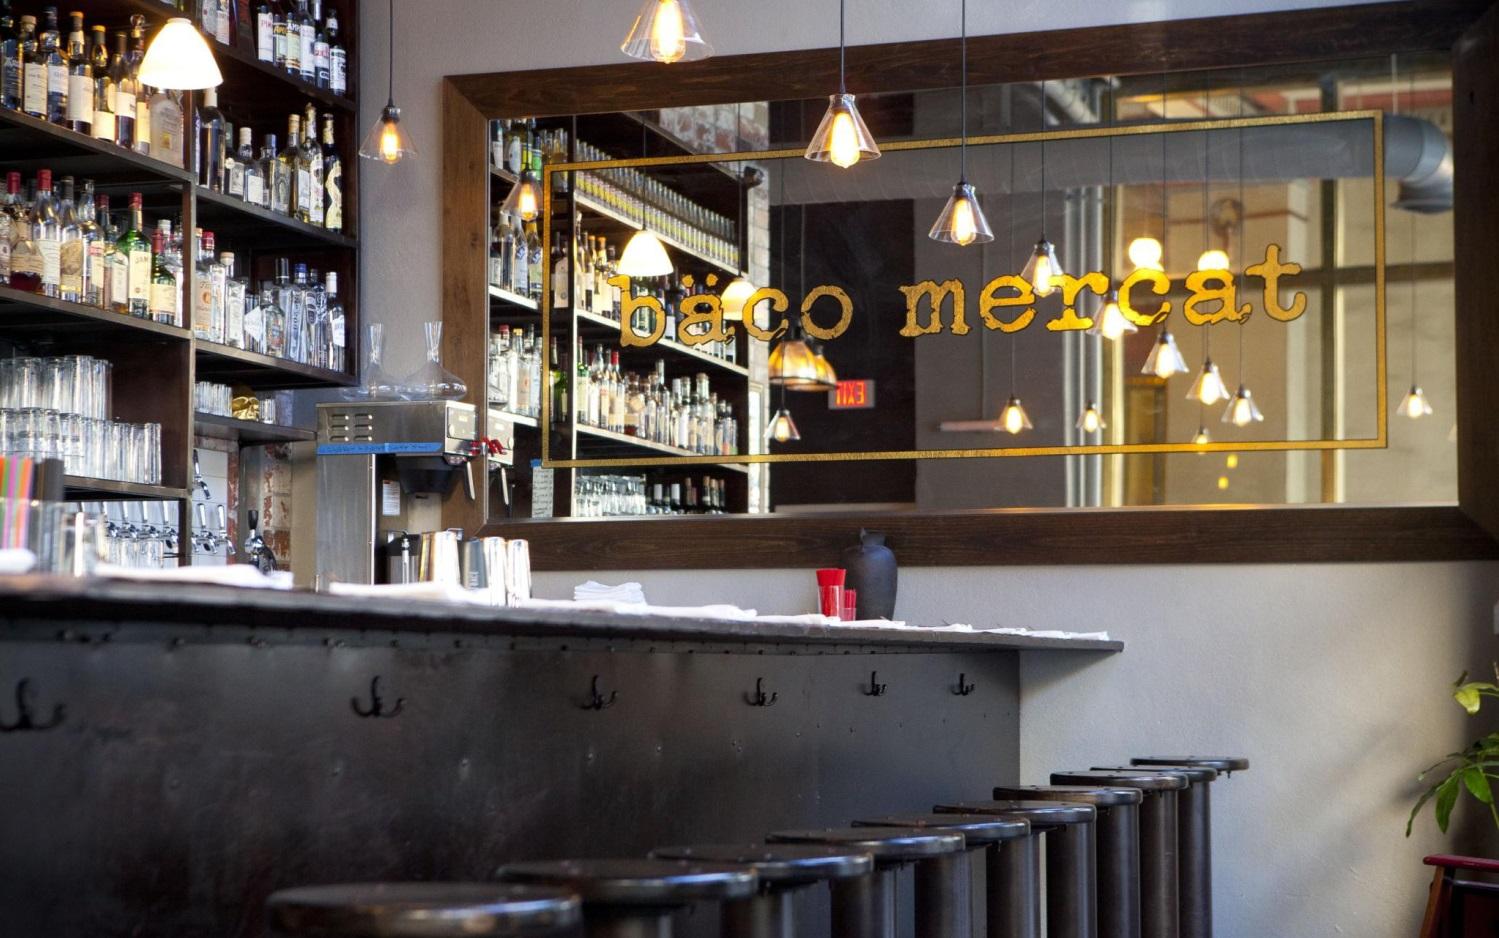 Baco Mercat, Mexican restaurant